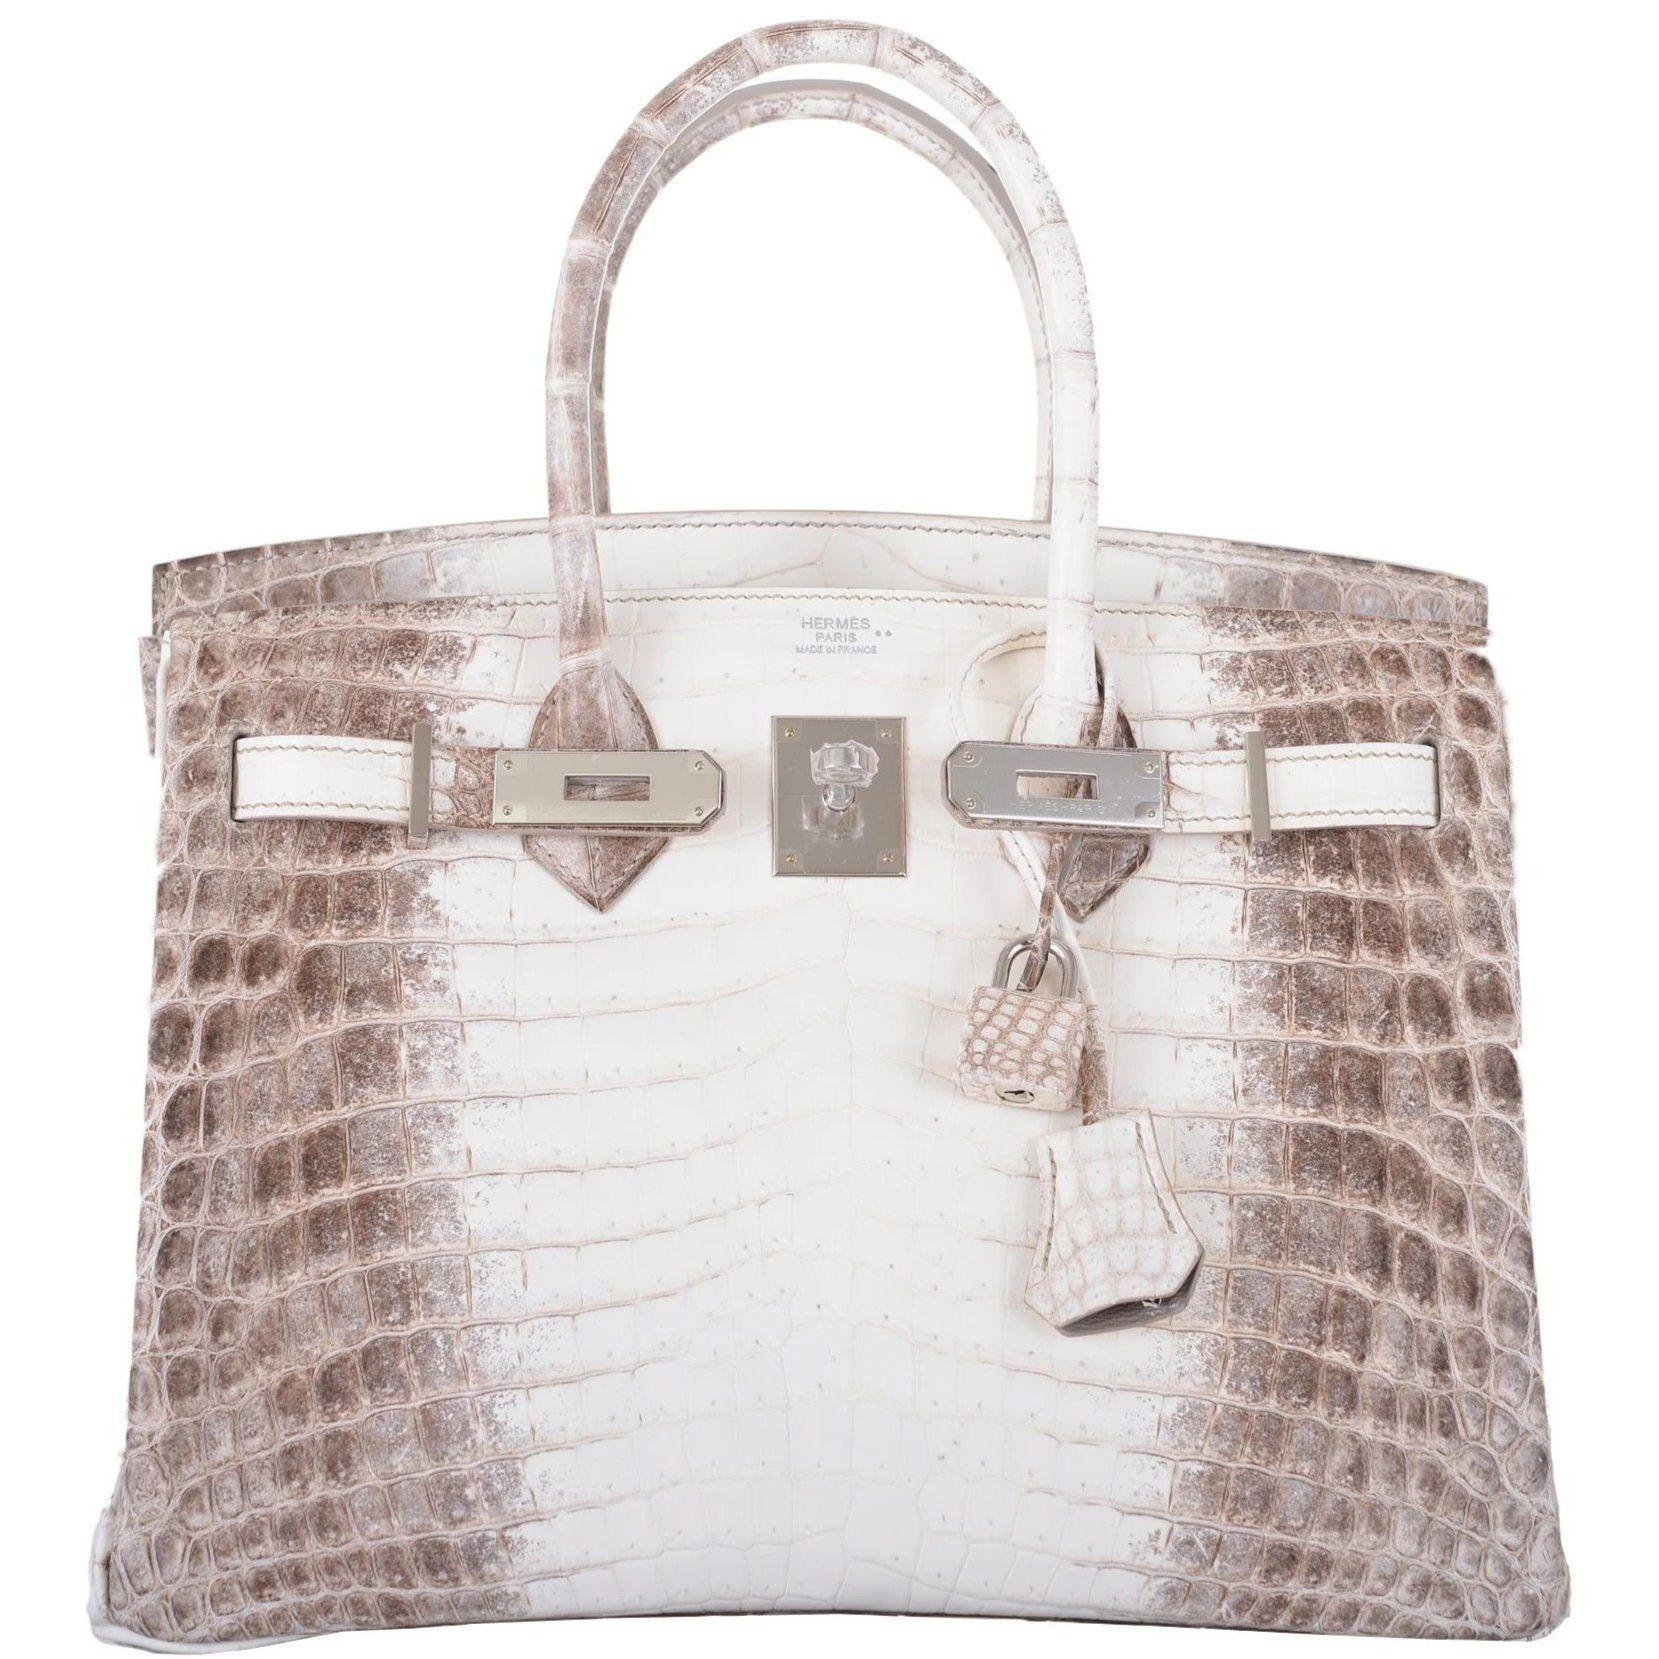 Hermes Birkin Bag Himalayan White Crocodile